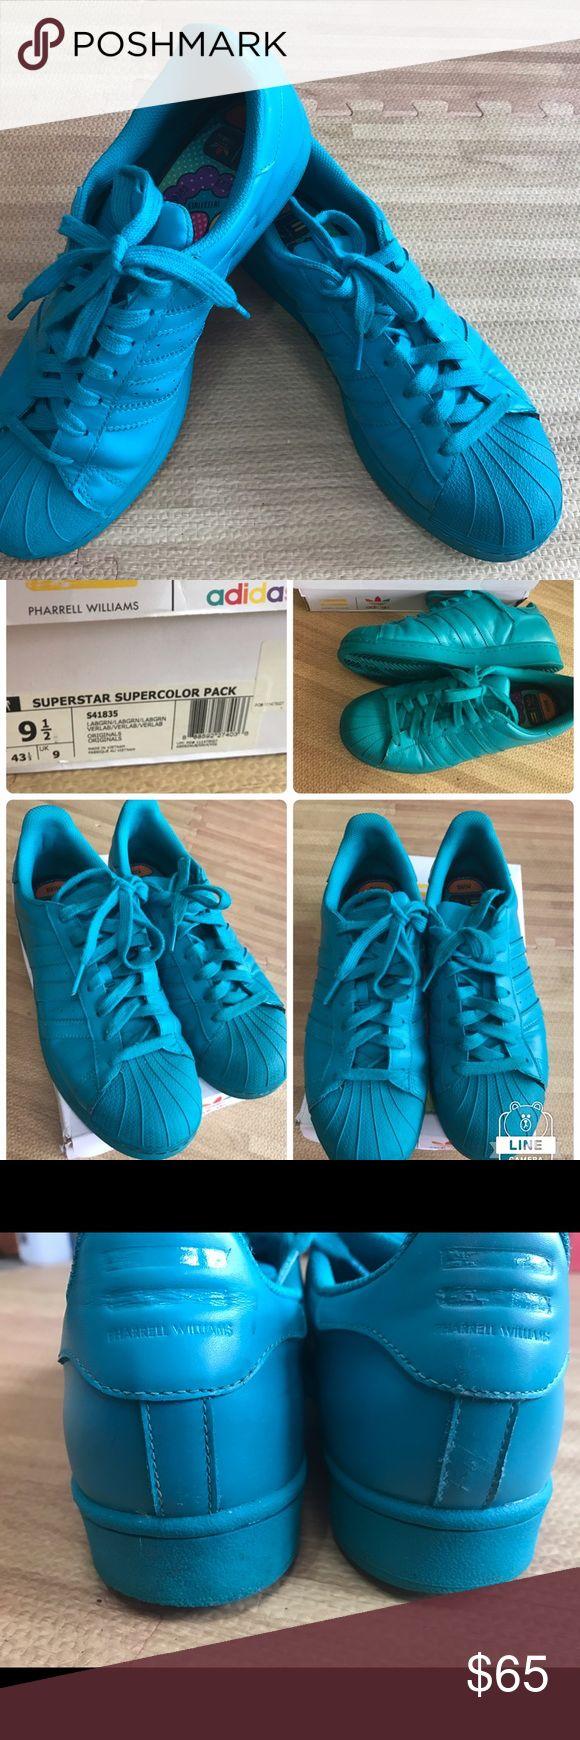 Adidas Superstar super color sz 9.5 mens Adidas superstar super color mens sz 9.5 authentic 100% by Adidas good condition Adidas Shoes Athletic Shoes